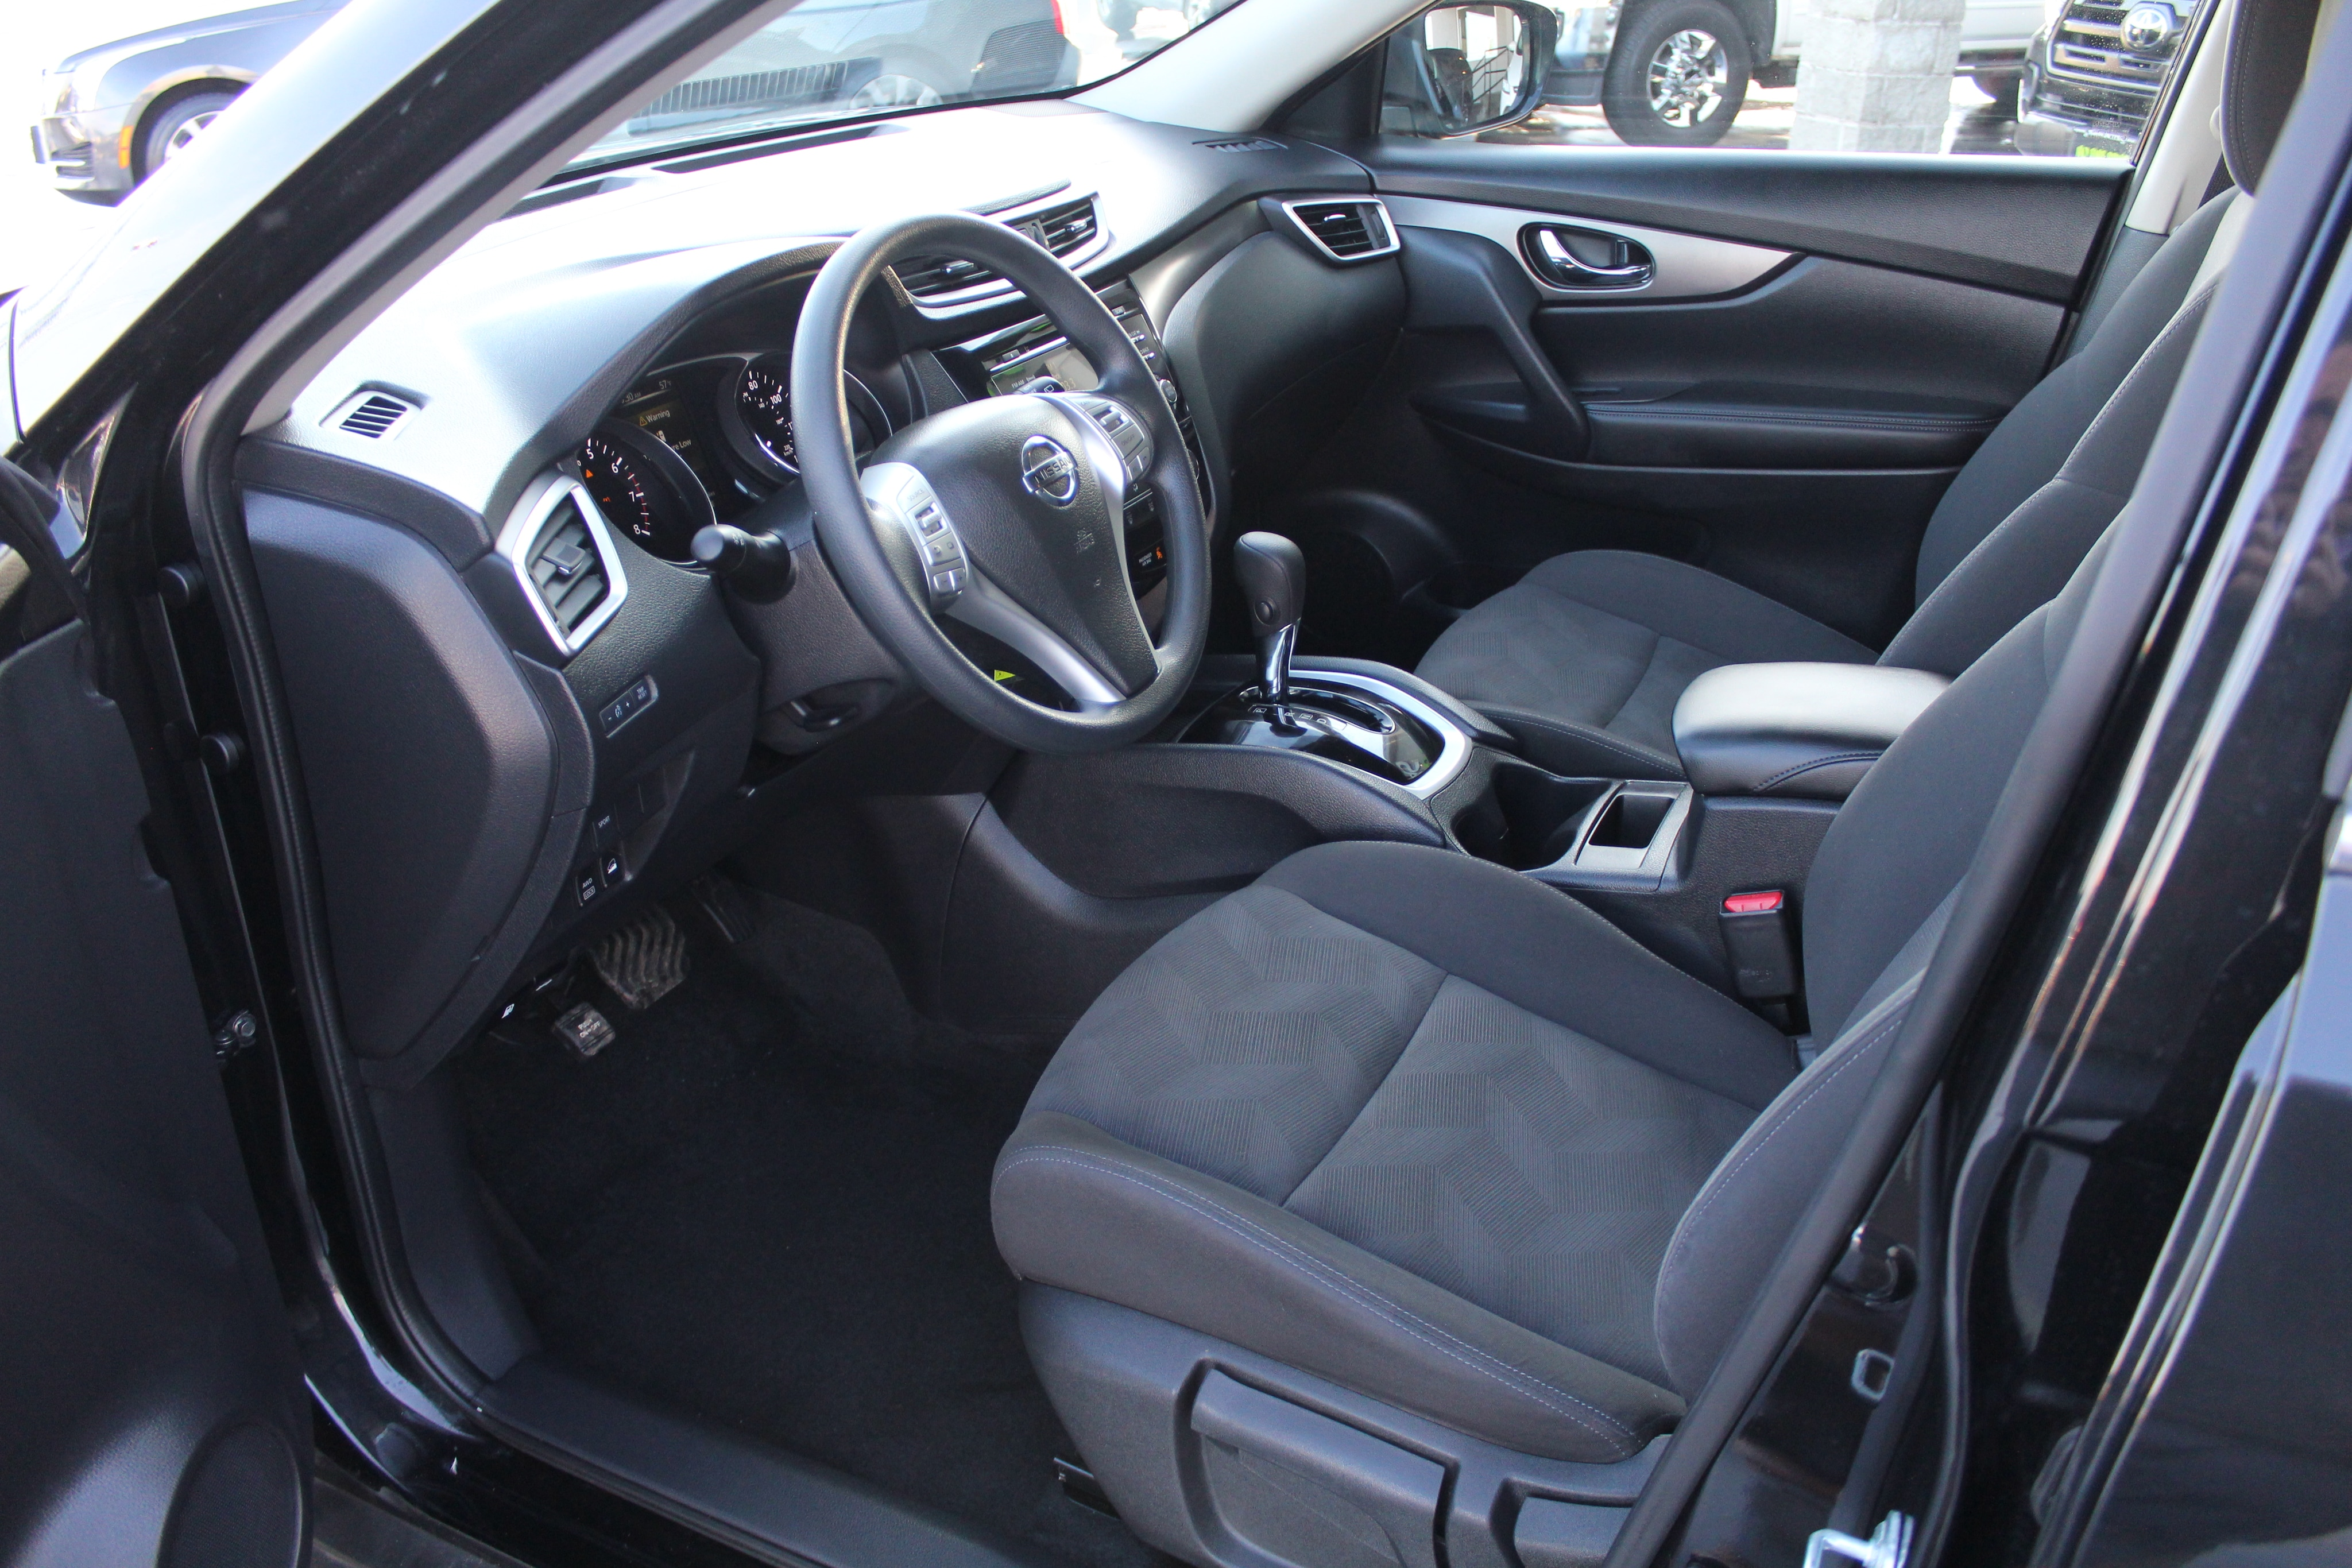 2016 Nissan Rogue Wagon 4 Dr.